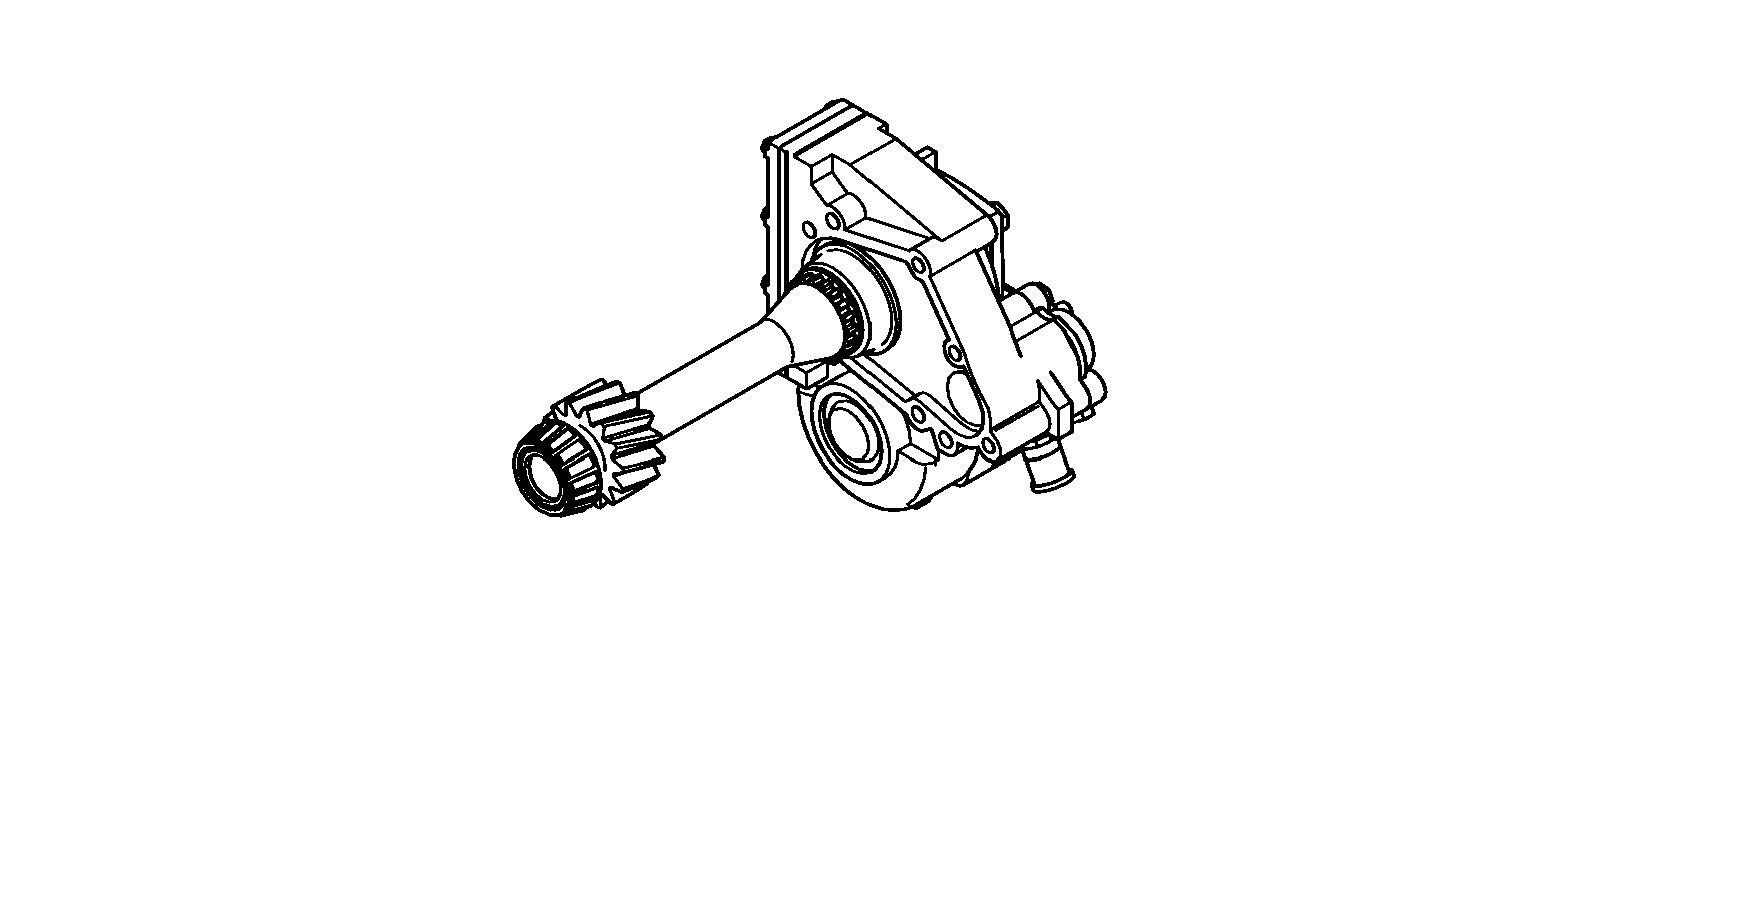 Zf 6090012032 - NH 1 B